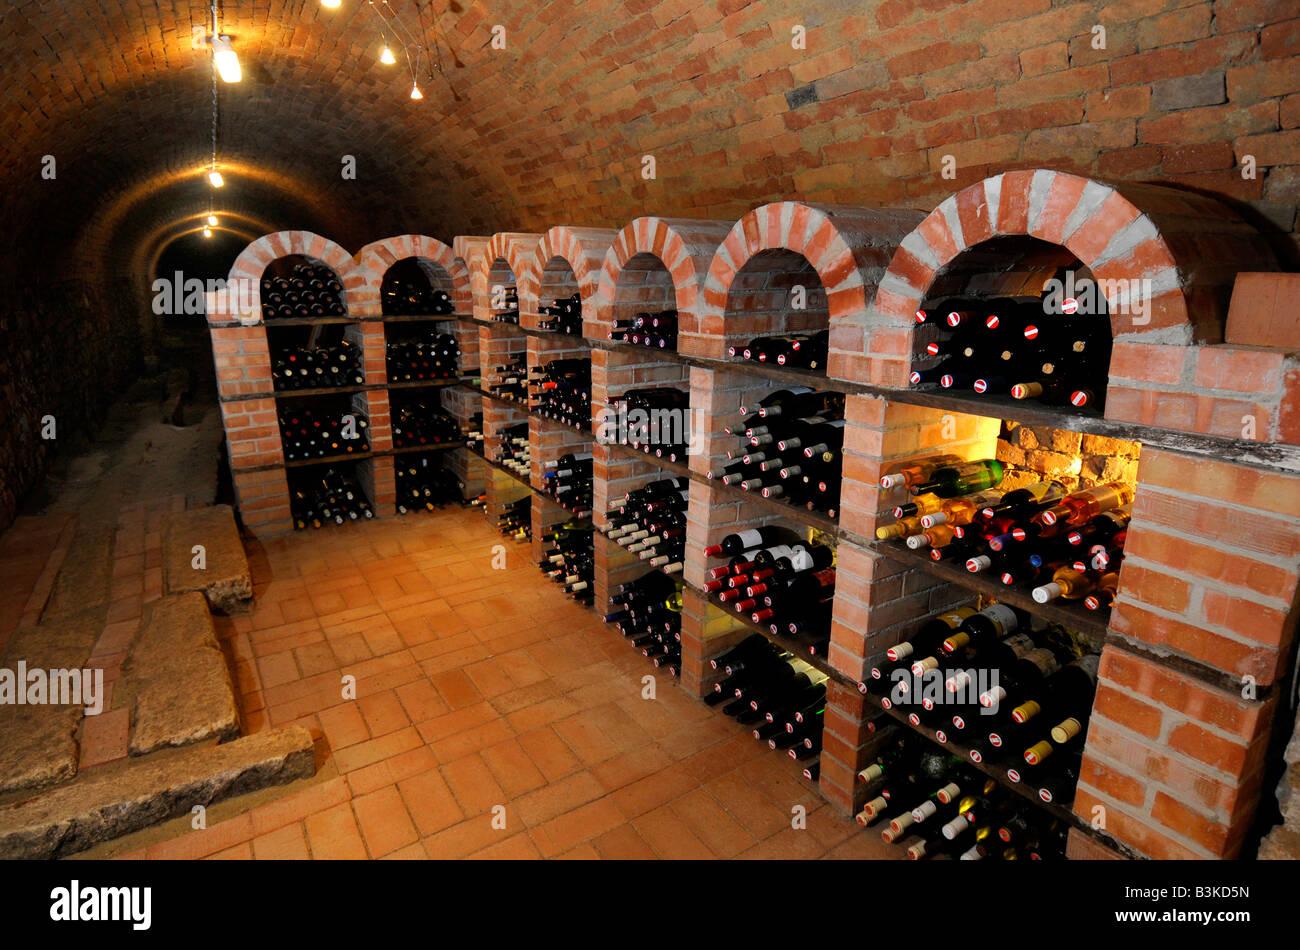 Wine cellar, Austria - Stock Image